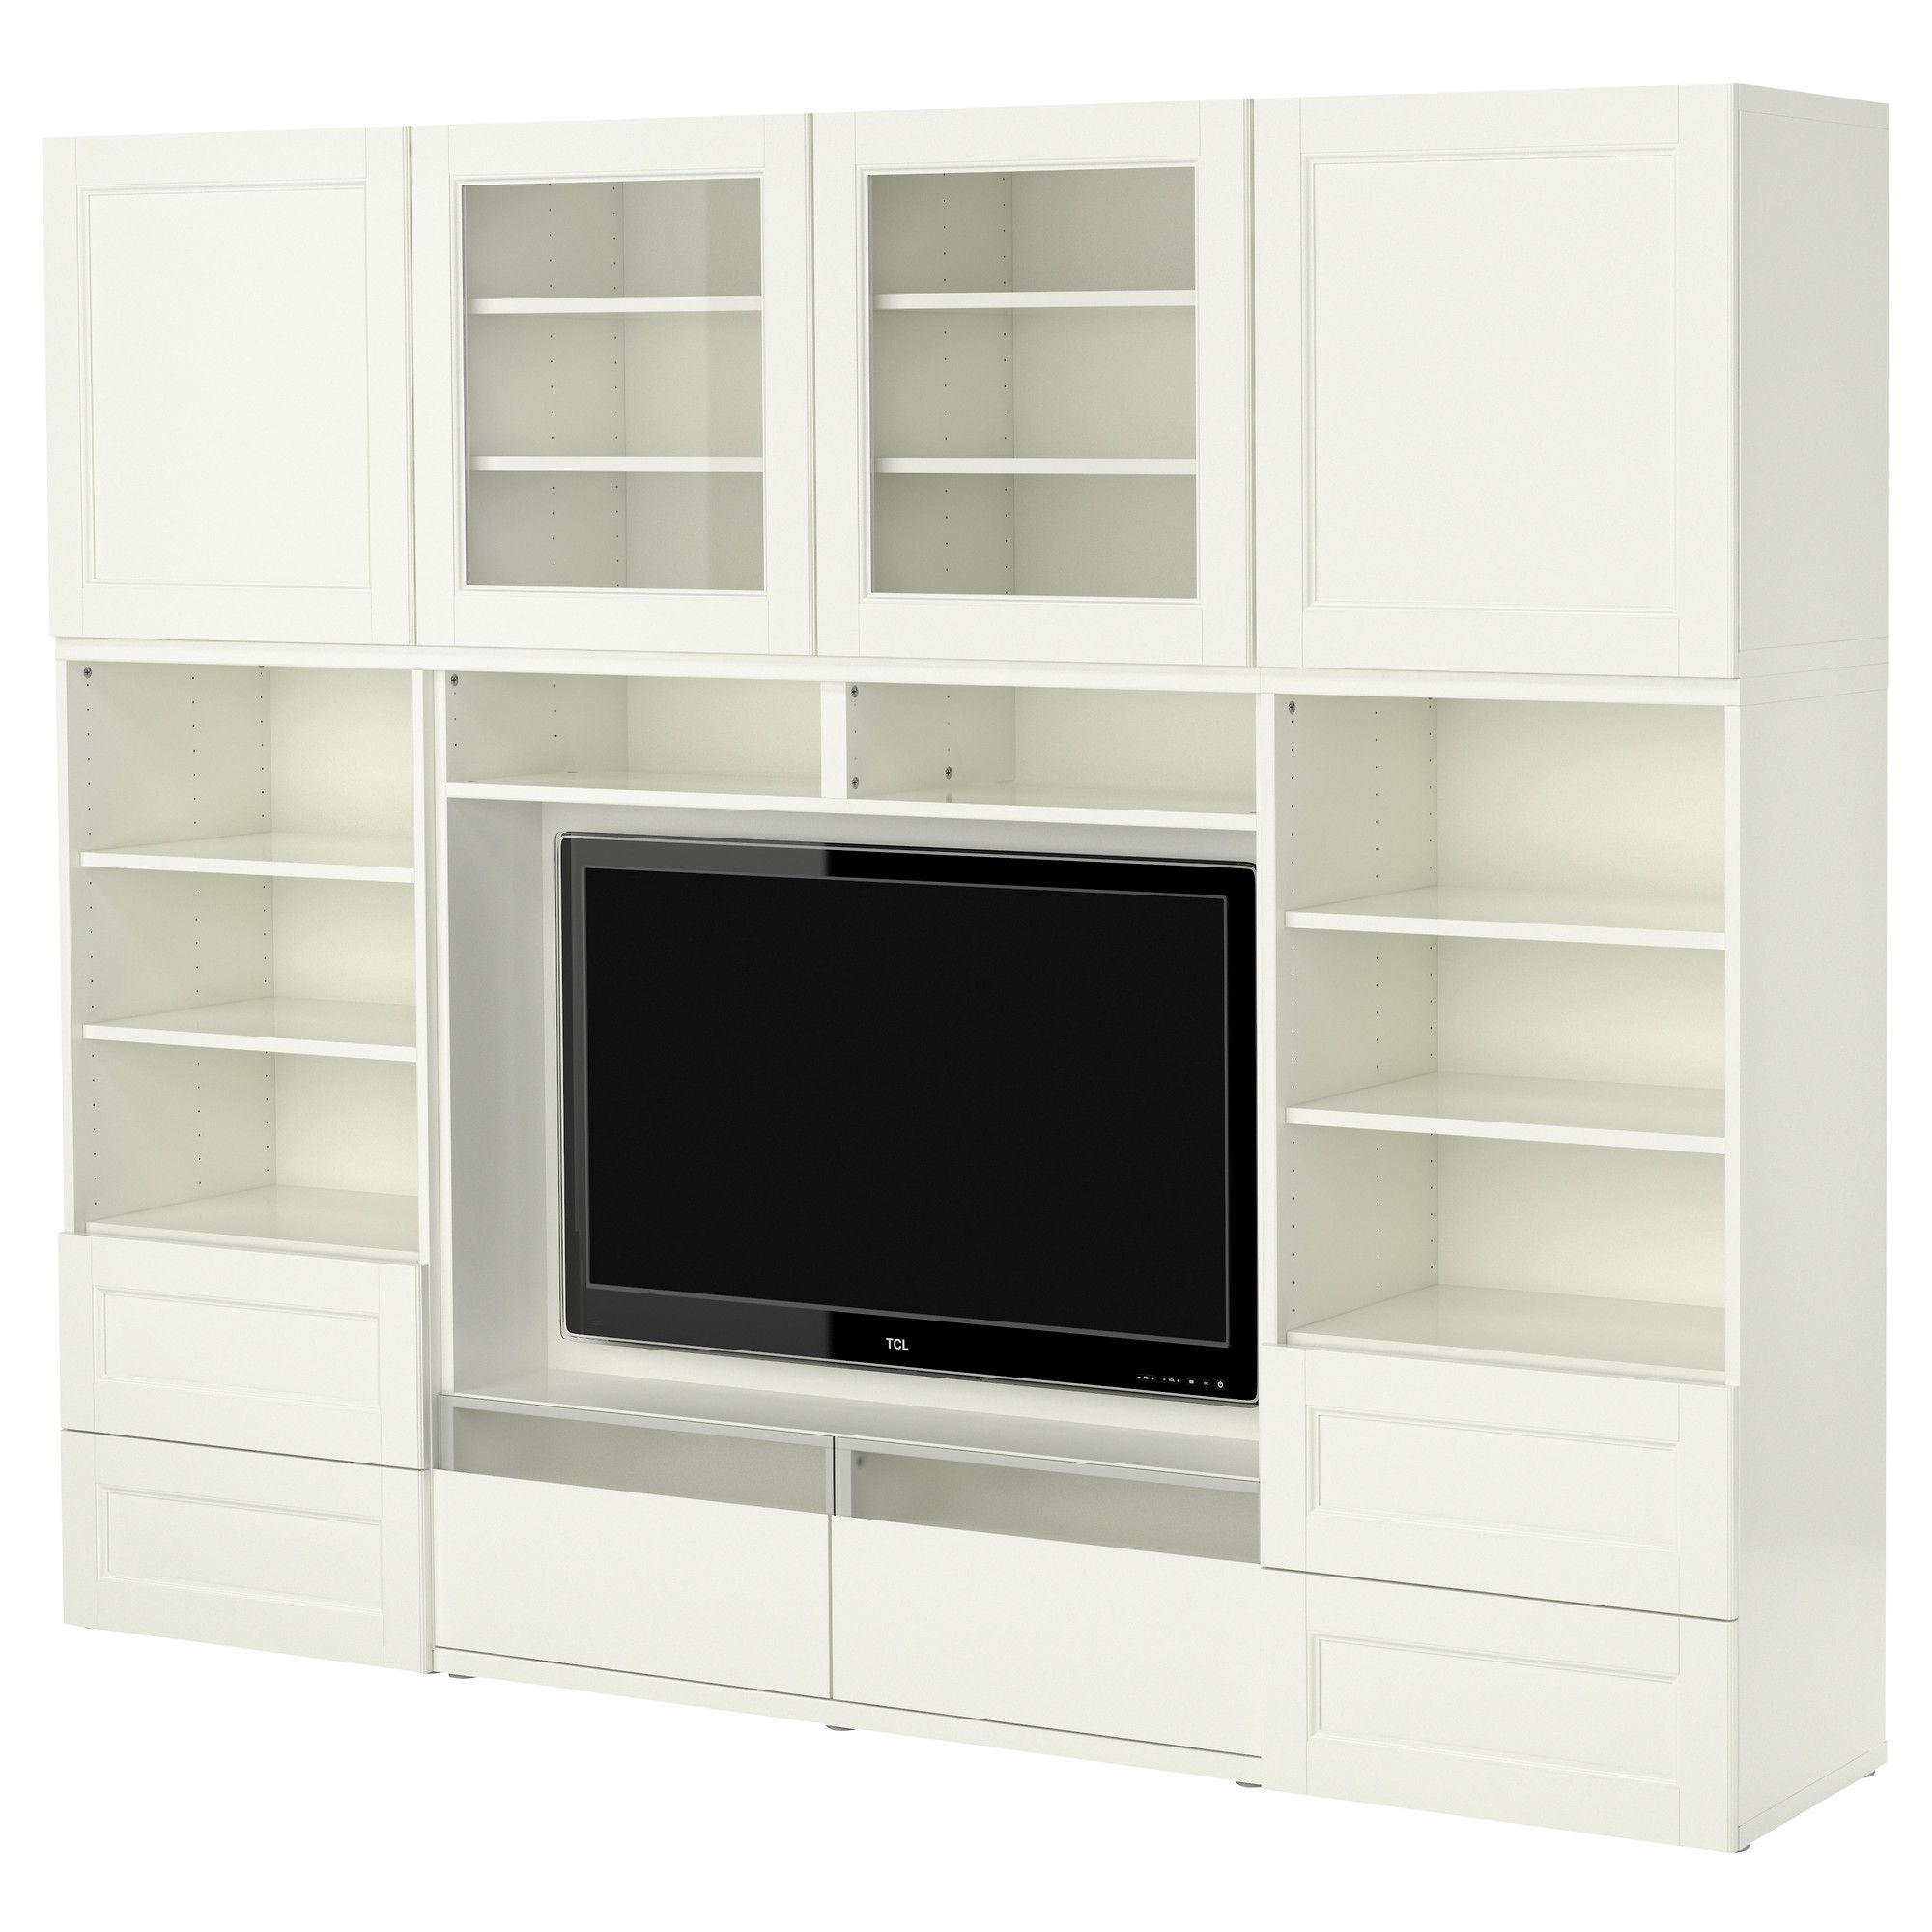 BESTÅ Mueble almacenaje/TV - IKEA | ikea | Pinterest | Tv ikea, Ikea ...